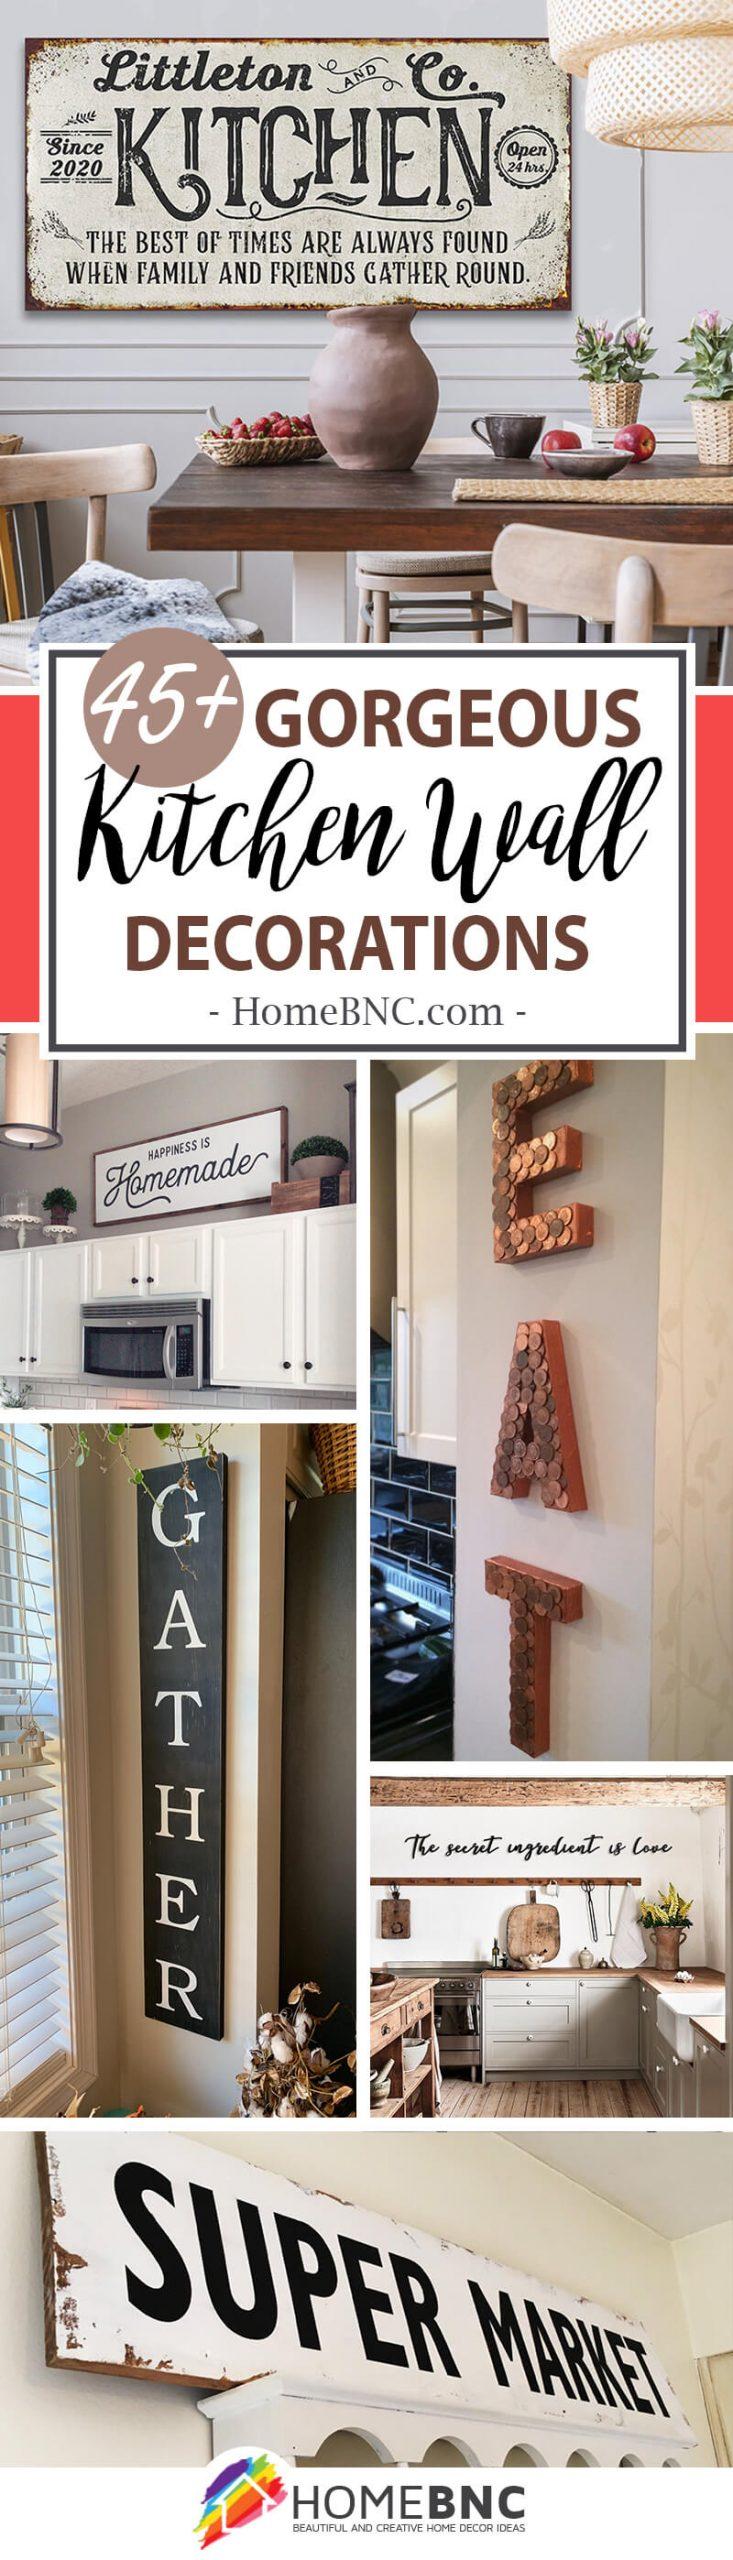 Kitchen Wall Decorations Homebnc